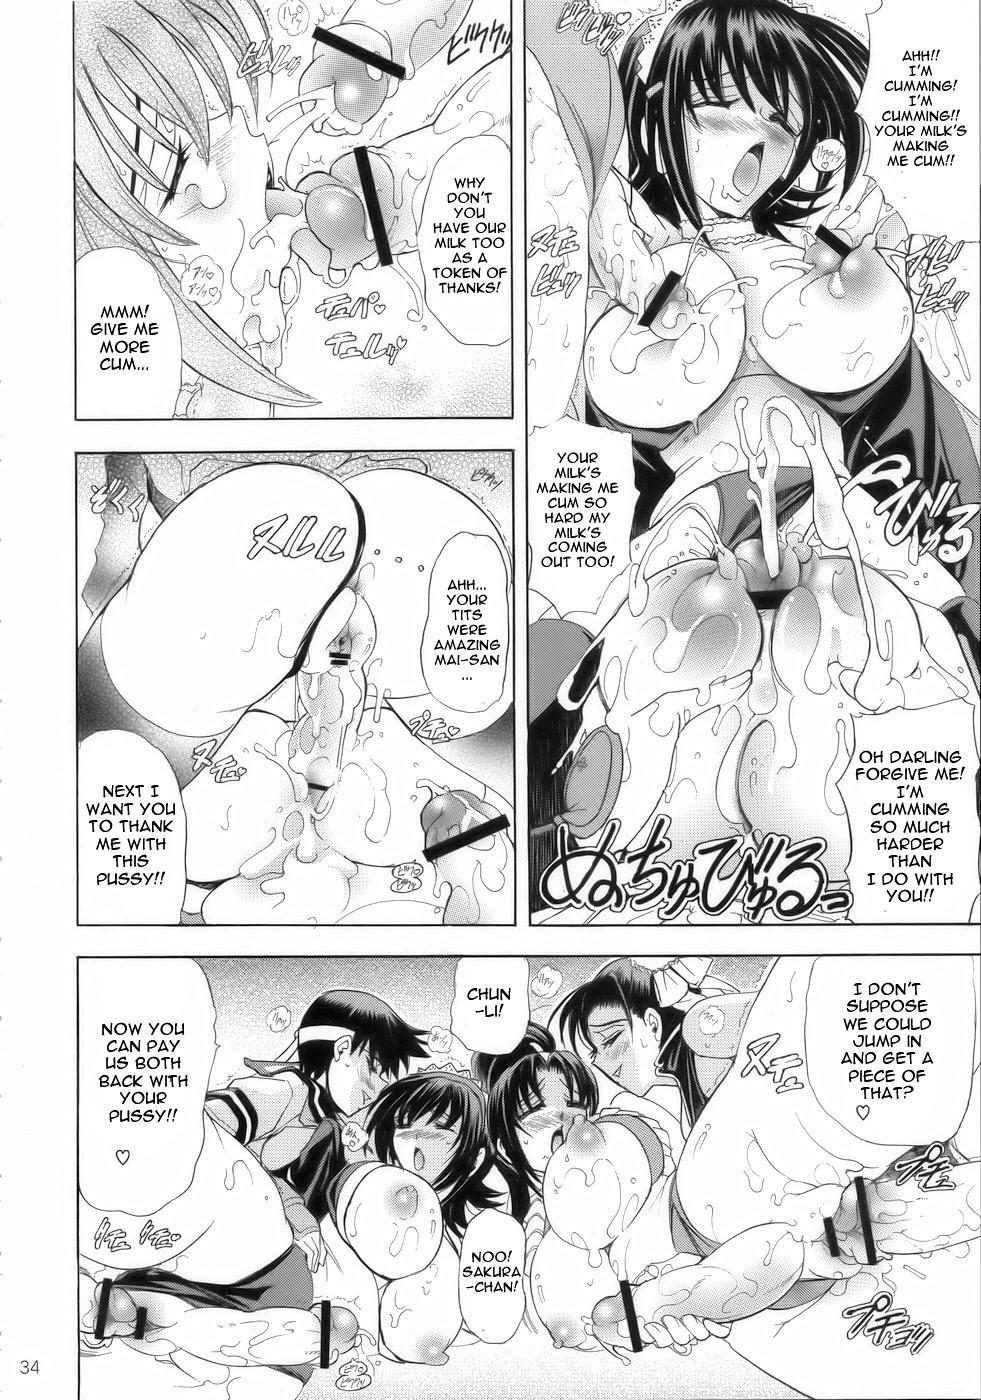 (C75) [Kawaraya Honpo (Kawaraya A-ta)] Hana - Maki no Juunana - Housenka (Street Fighter) [English] [Yuribou] 32